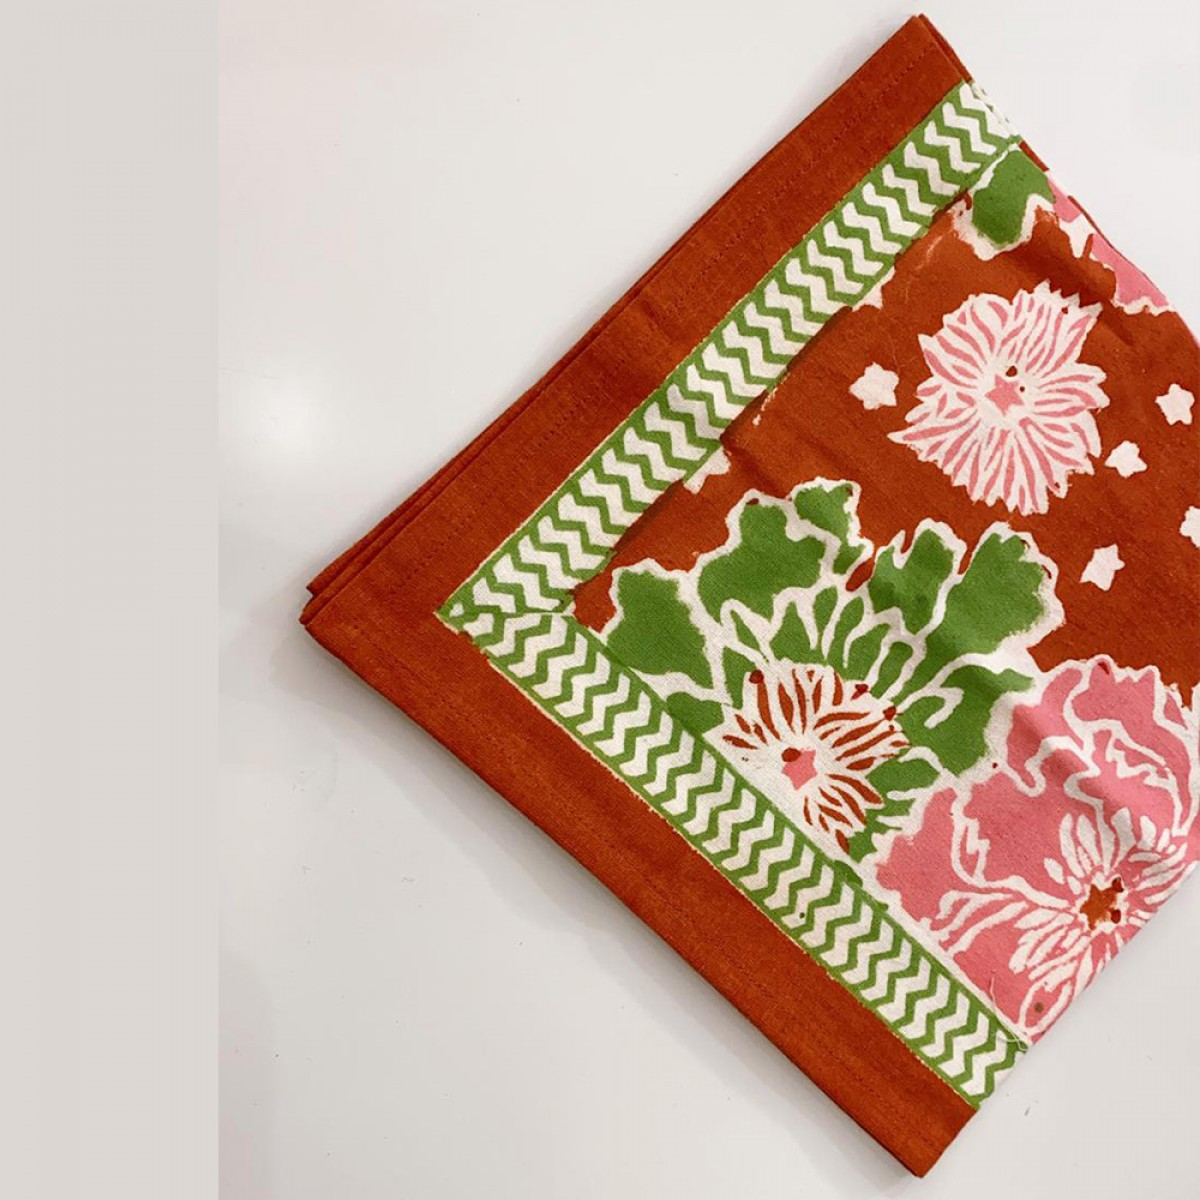 Cotton Printed Napkin - Red & Multi (Set of 6)